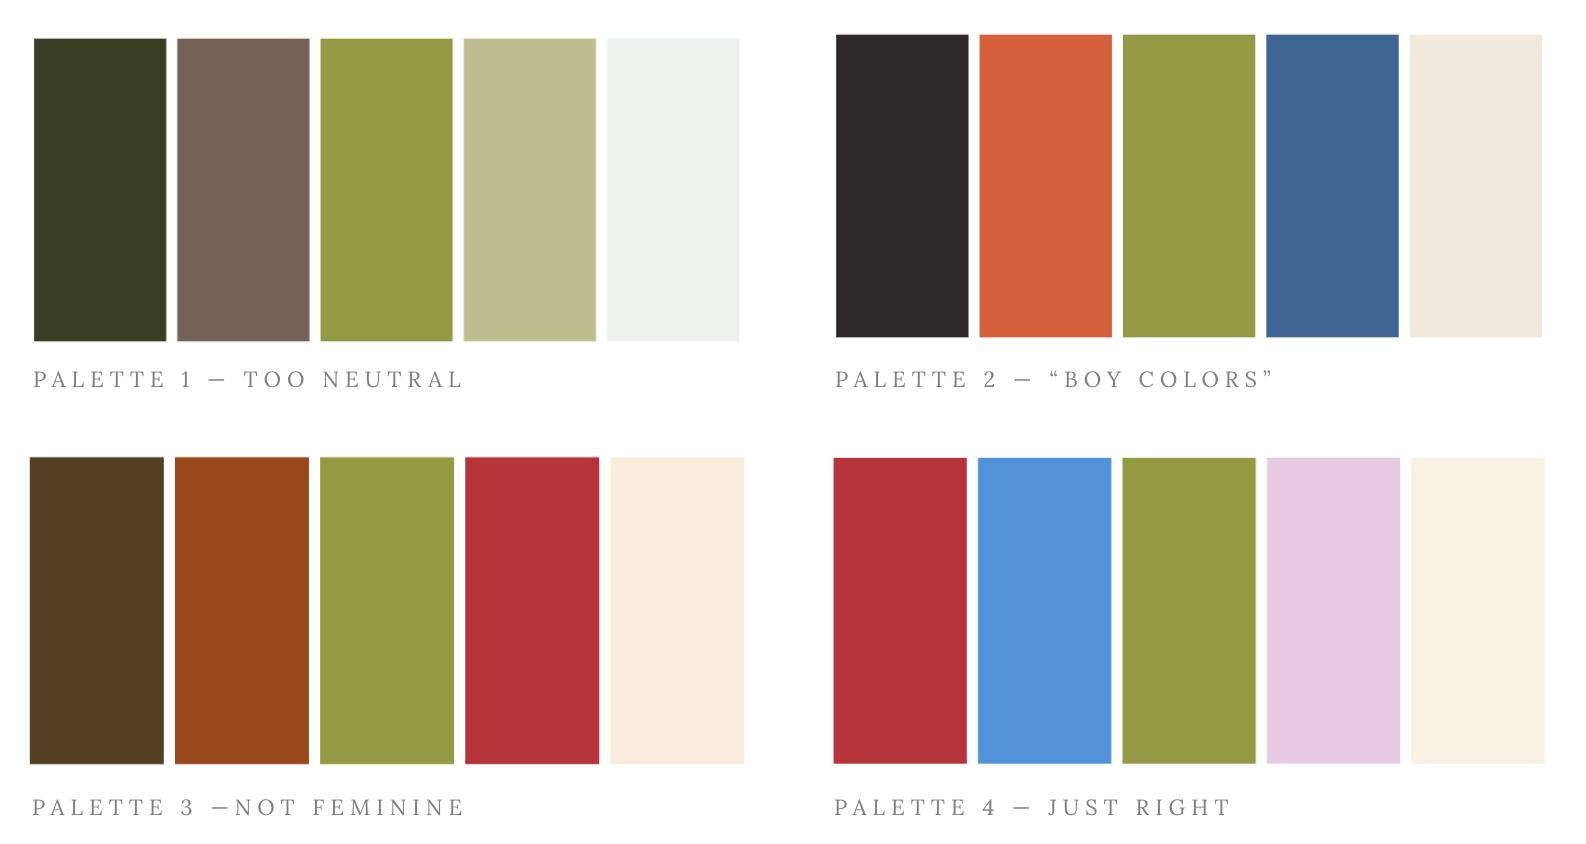 Color swatch studies